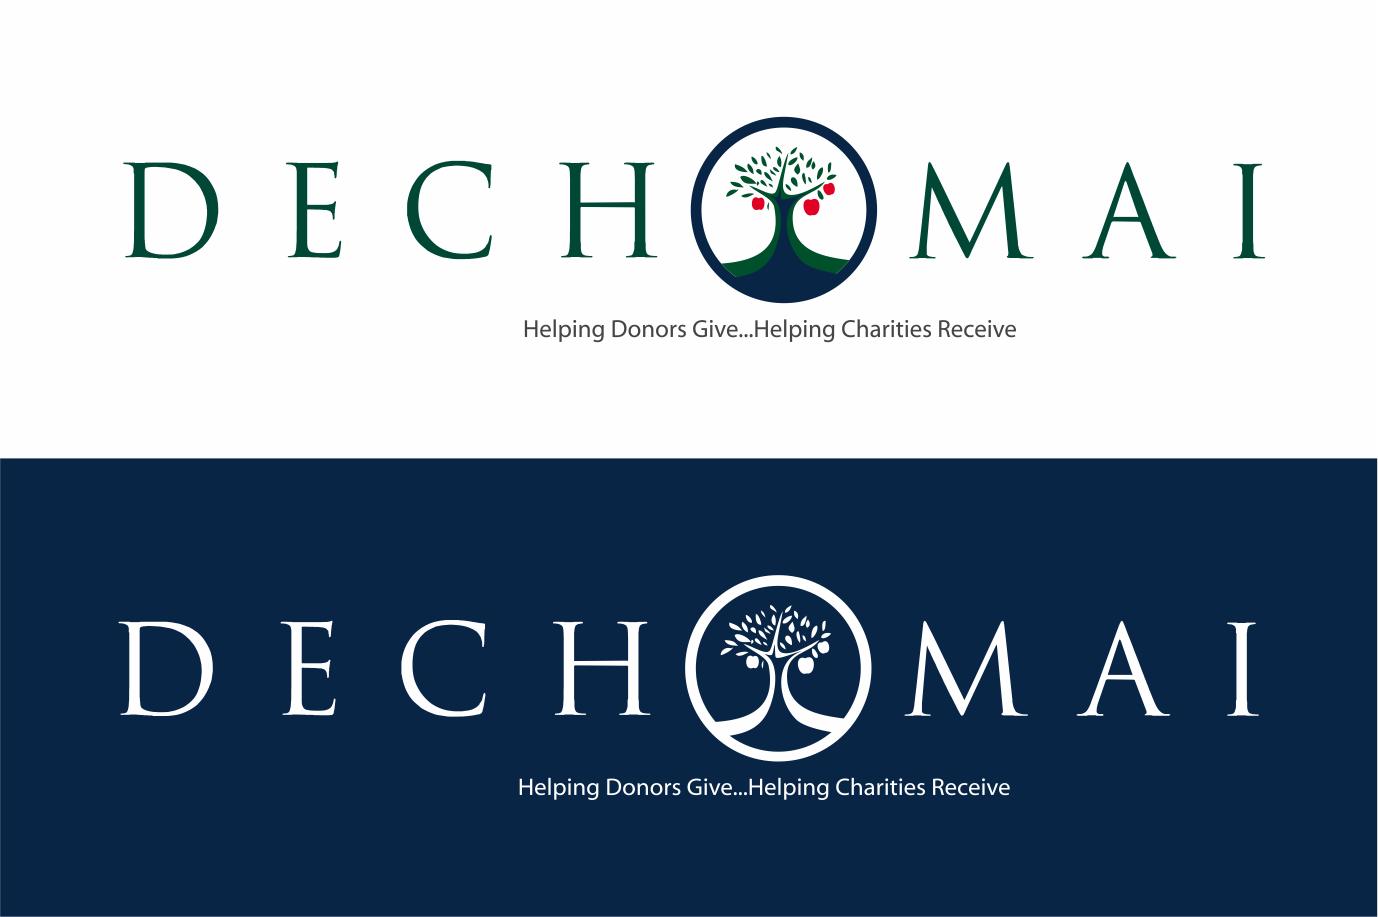 Dechomai needs a new logo